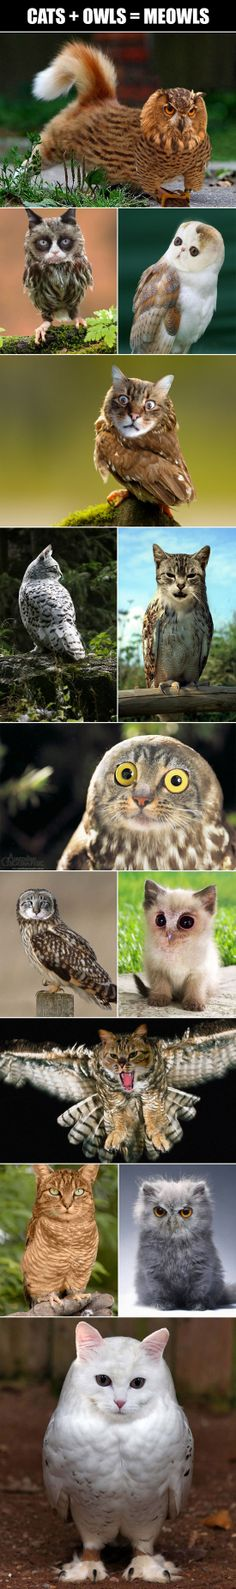 Cats + Owls = Meowls